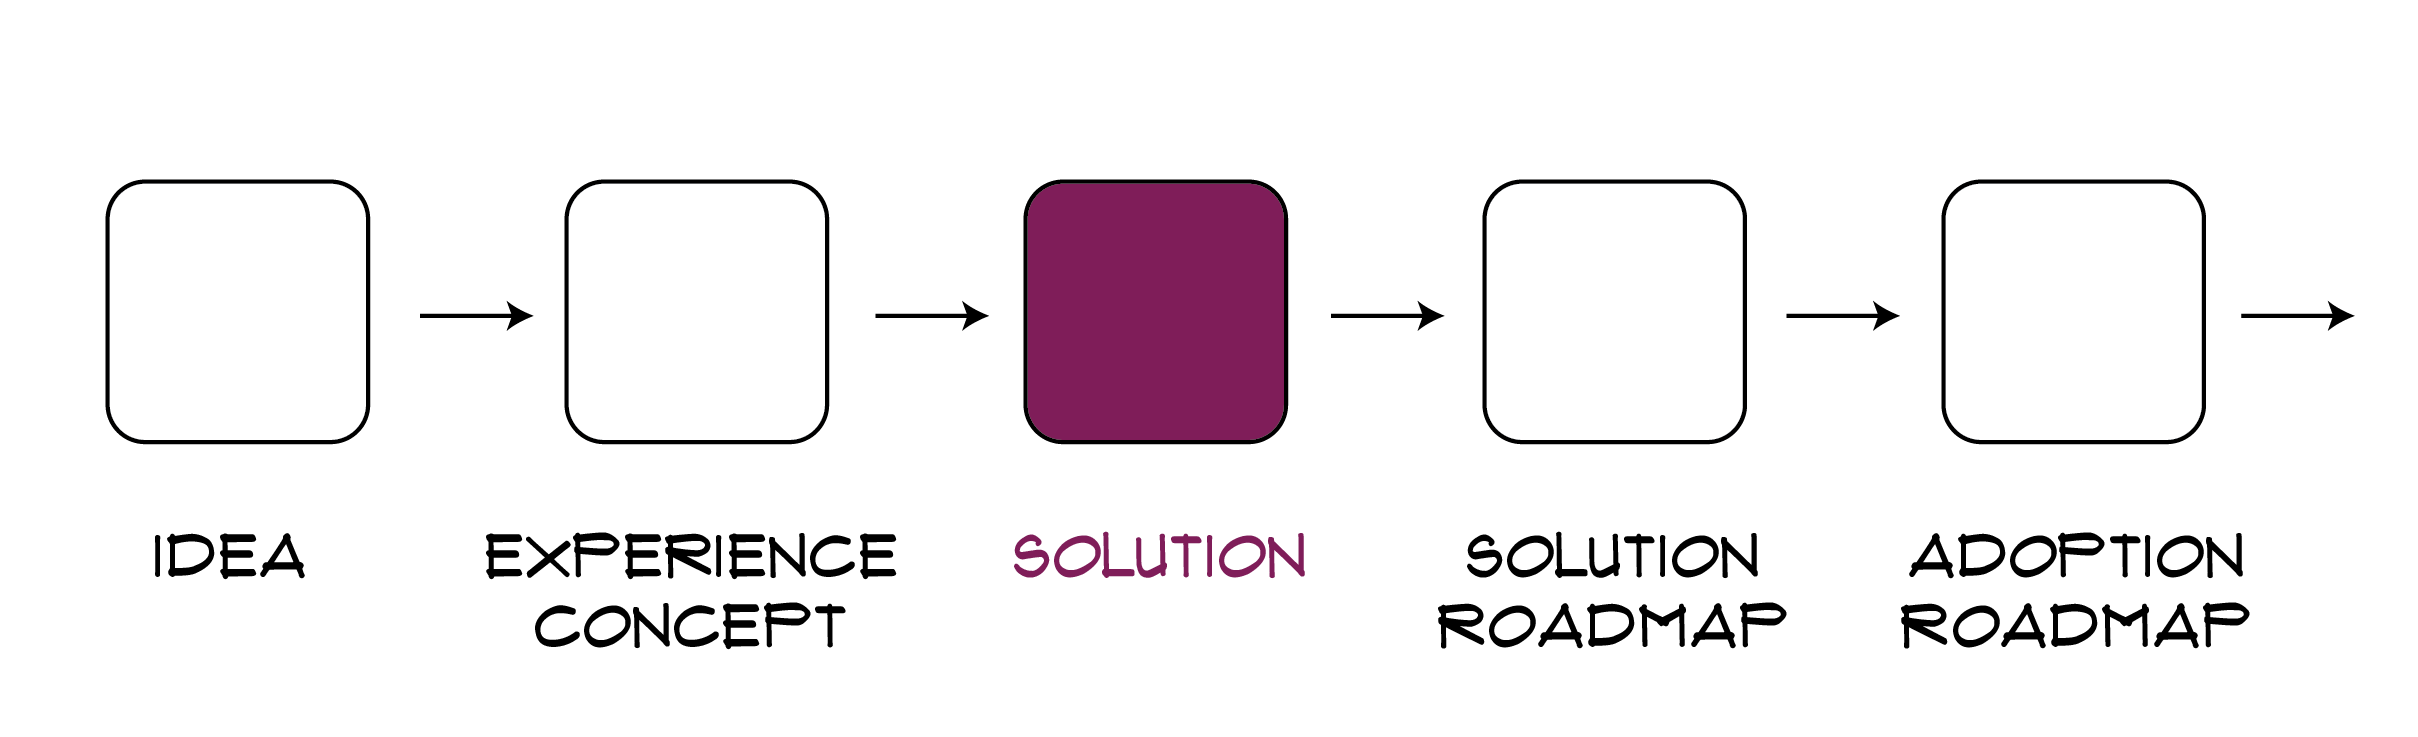 solution roadmap-01-01